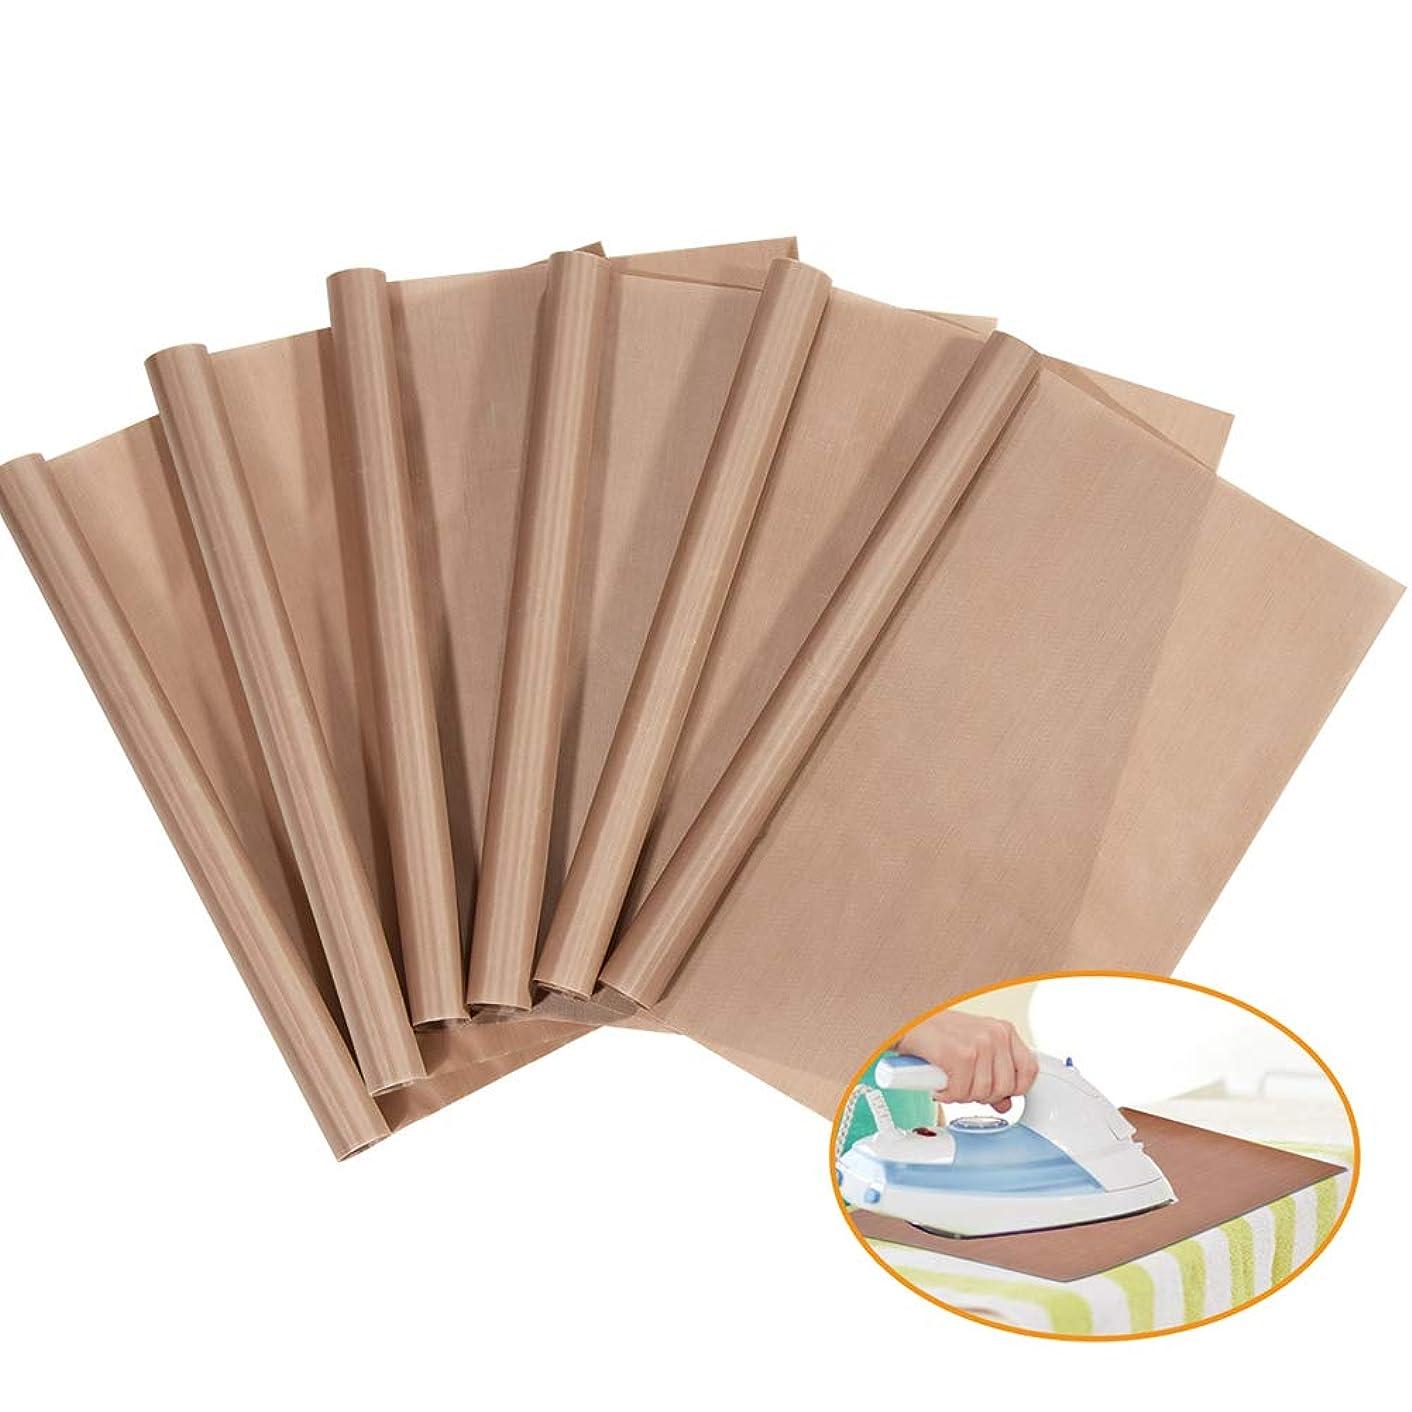 PTSLKHN PTFE Teflon Sheet for Heat Press Transfer Sheet Non Stick 16 x 20